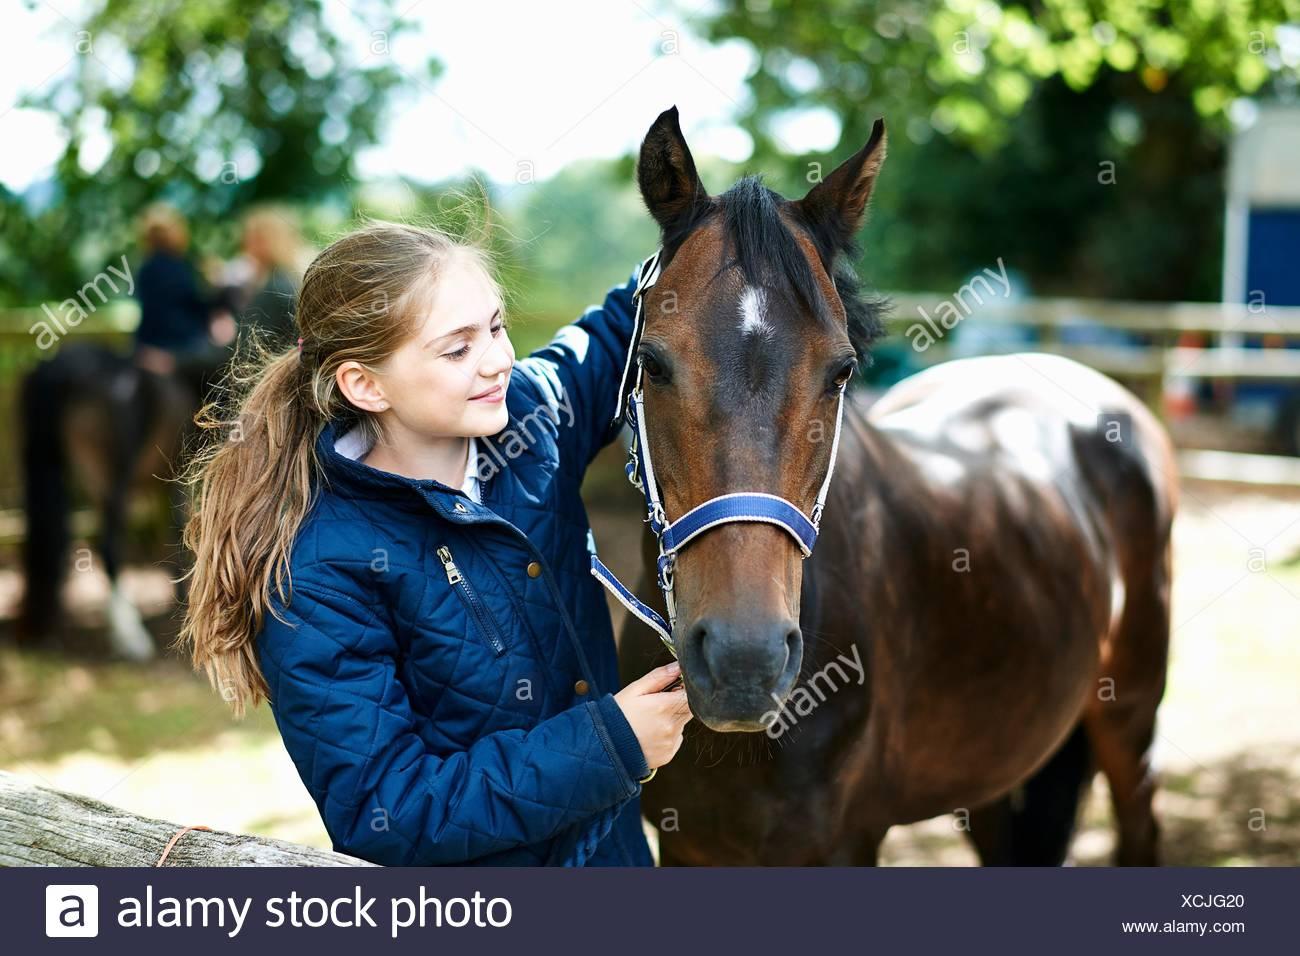 Girl putting halter onto horse - Stock Image